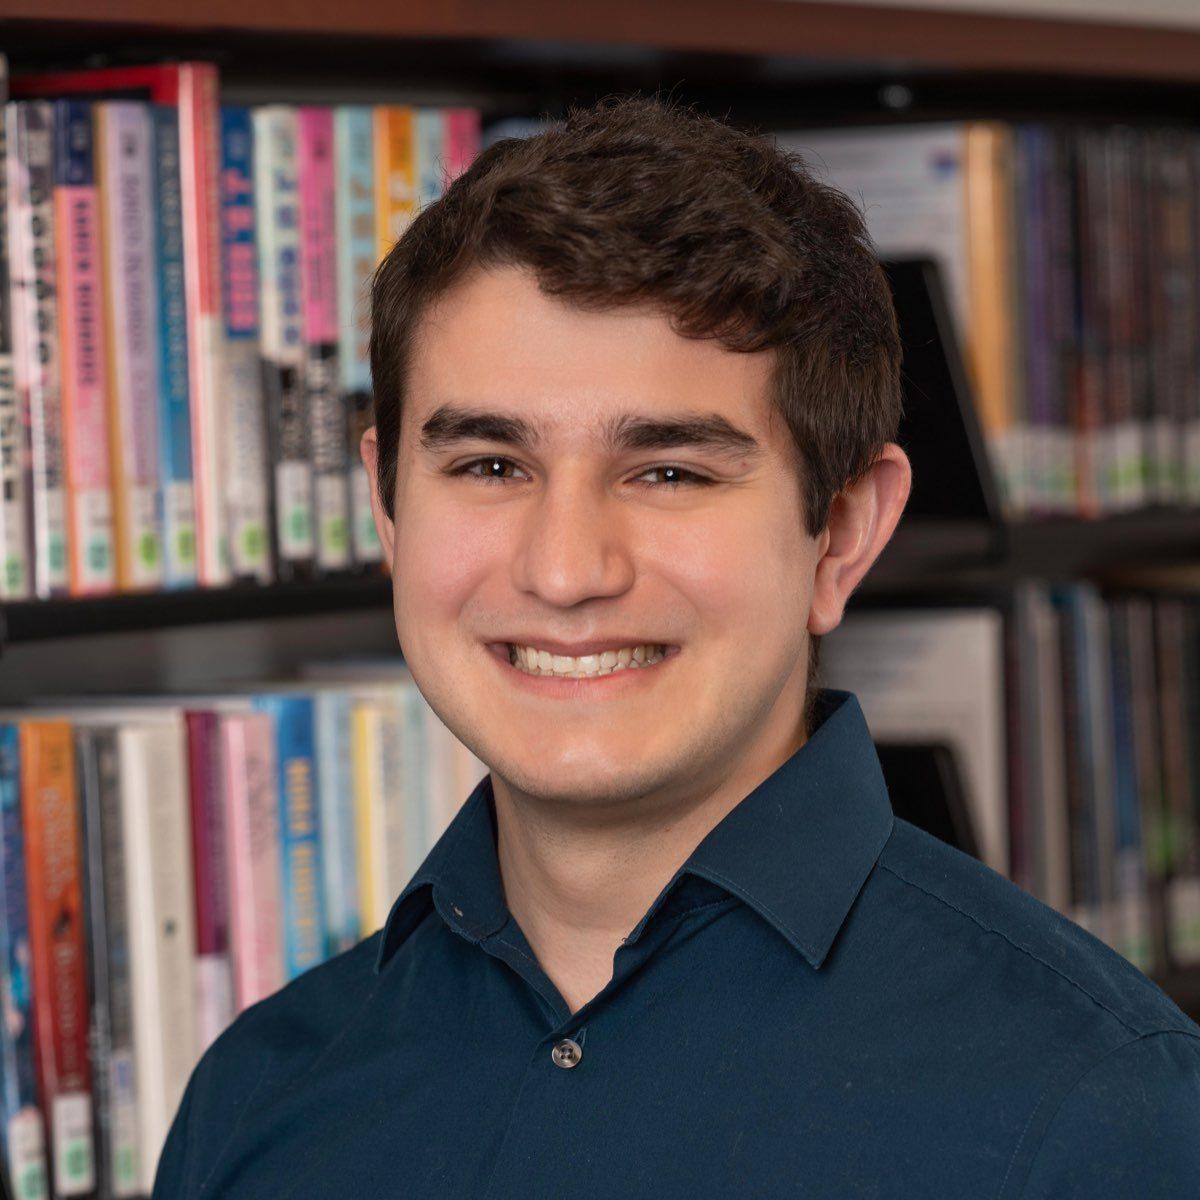 Daniel Thurston - Park City Library - Spanish Services Librarian